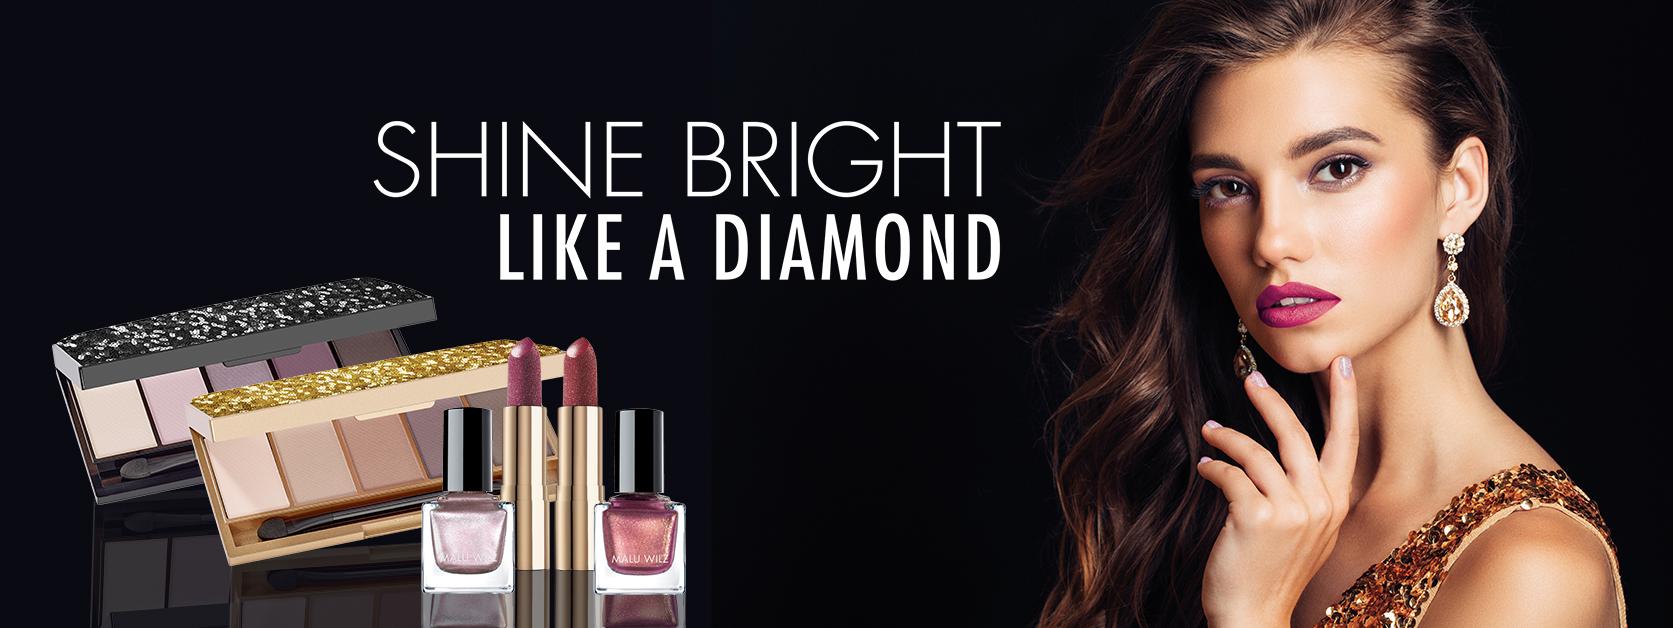 Porträt junge Frau mit Make up Produkten